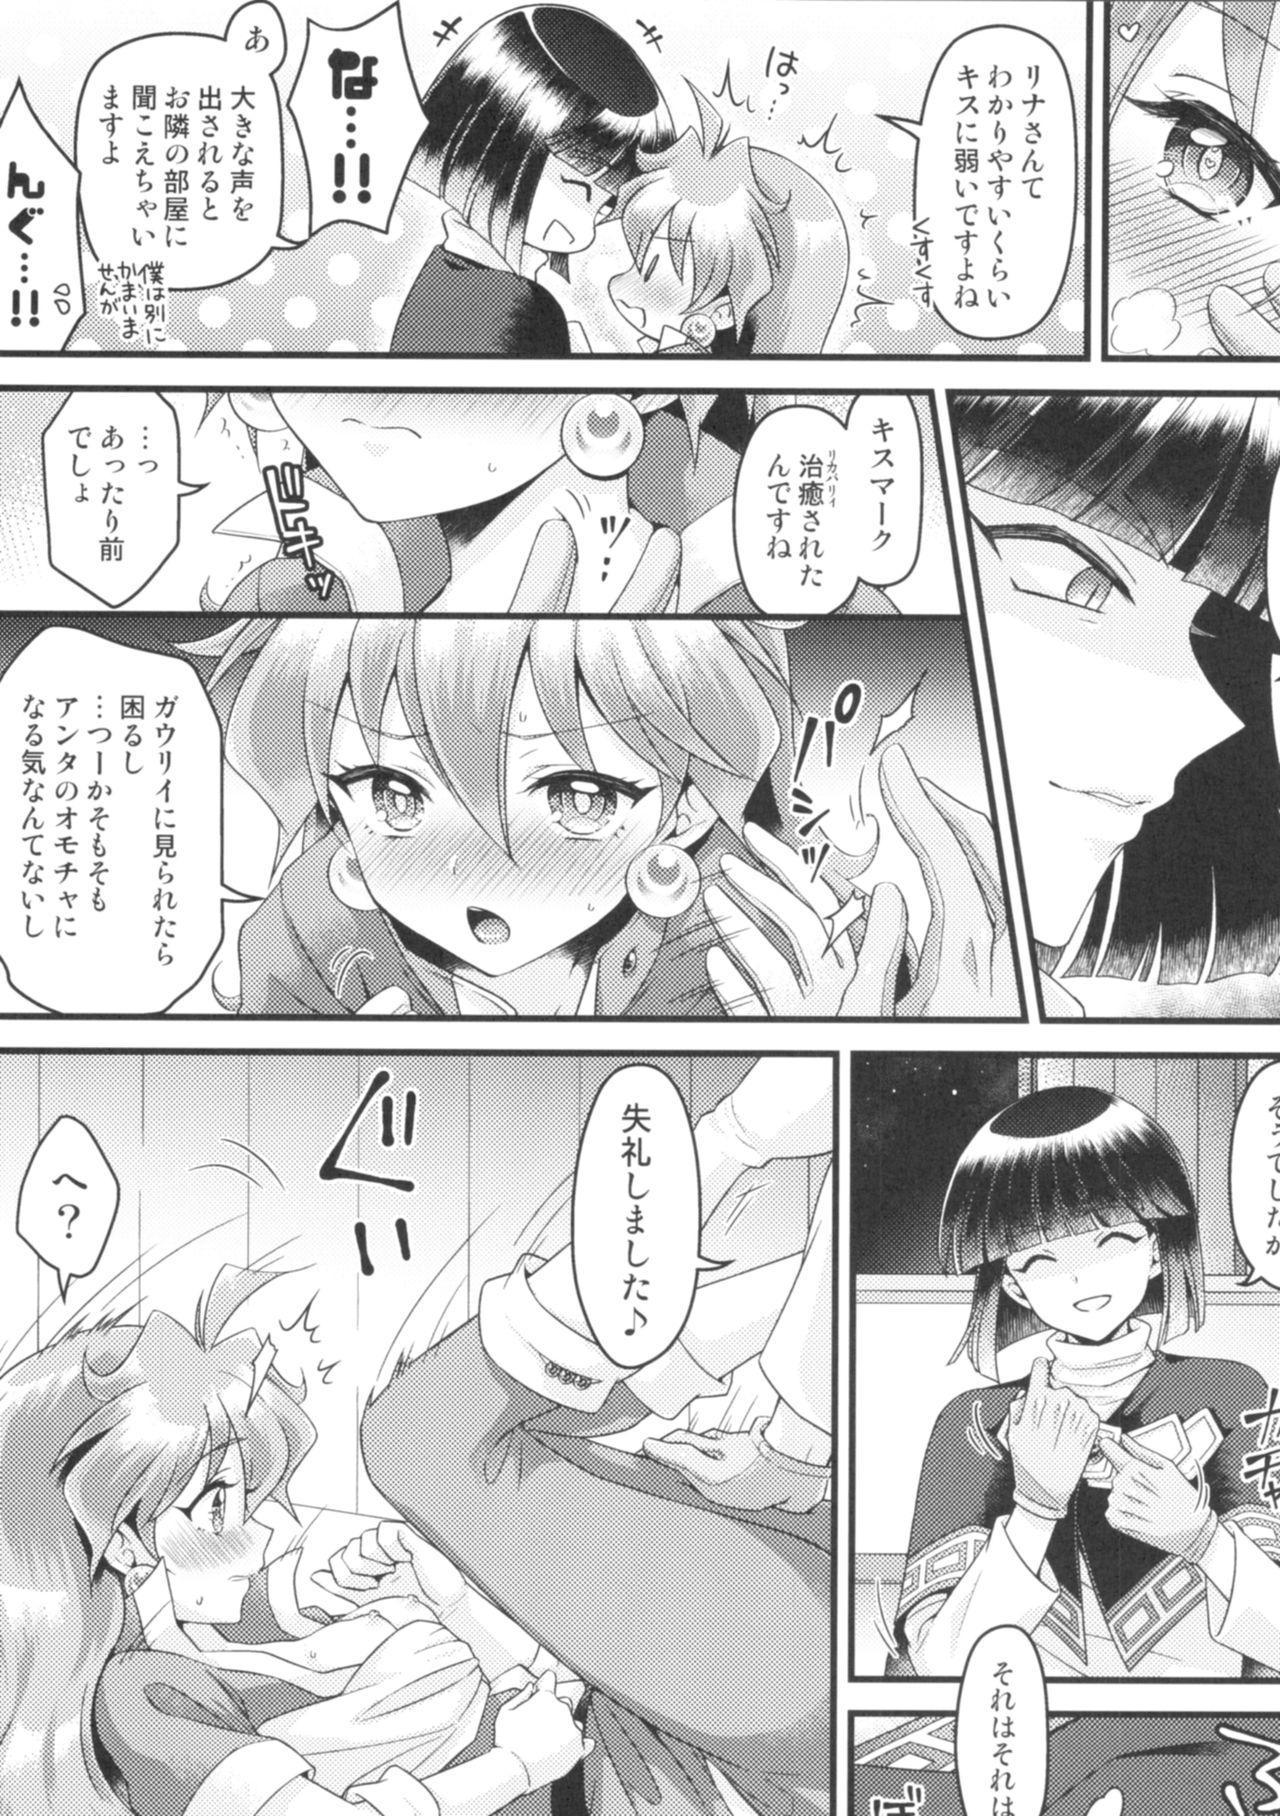 Lina Inverse Juu Shinkan ni NTR Love Love Ochi 8